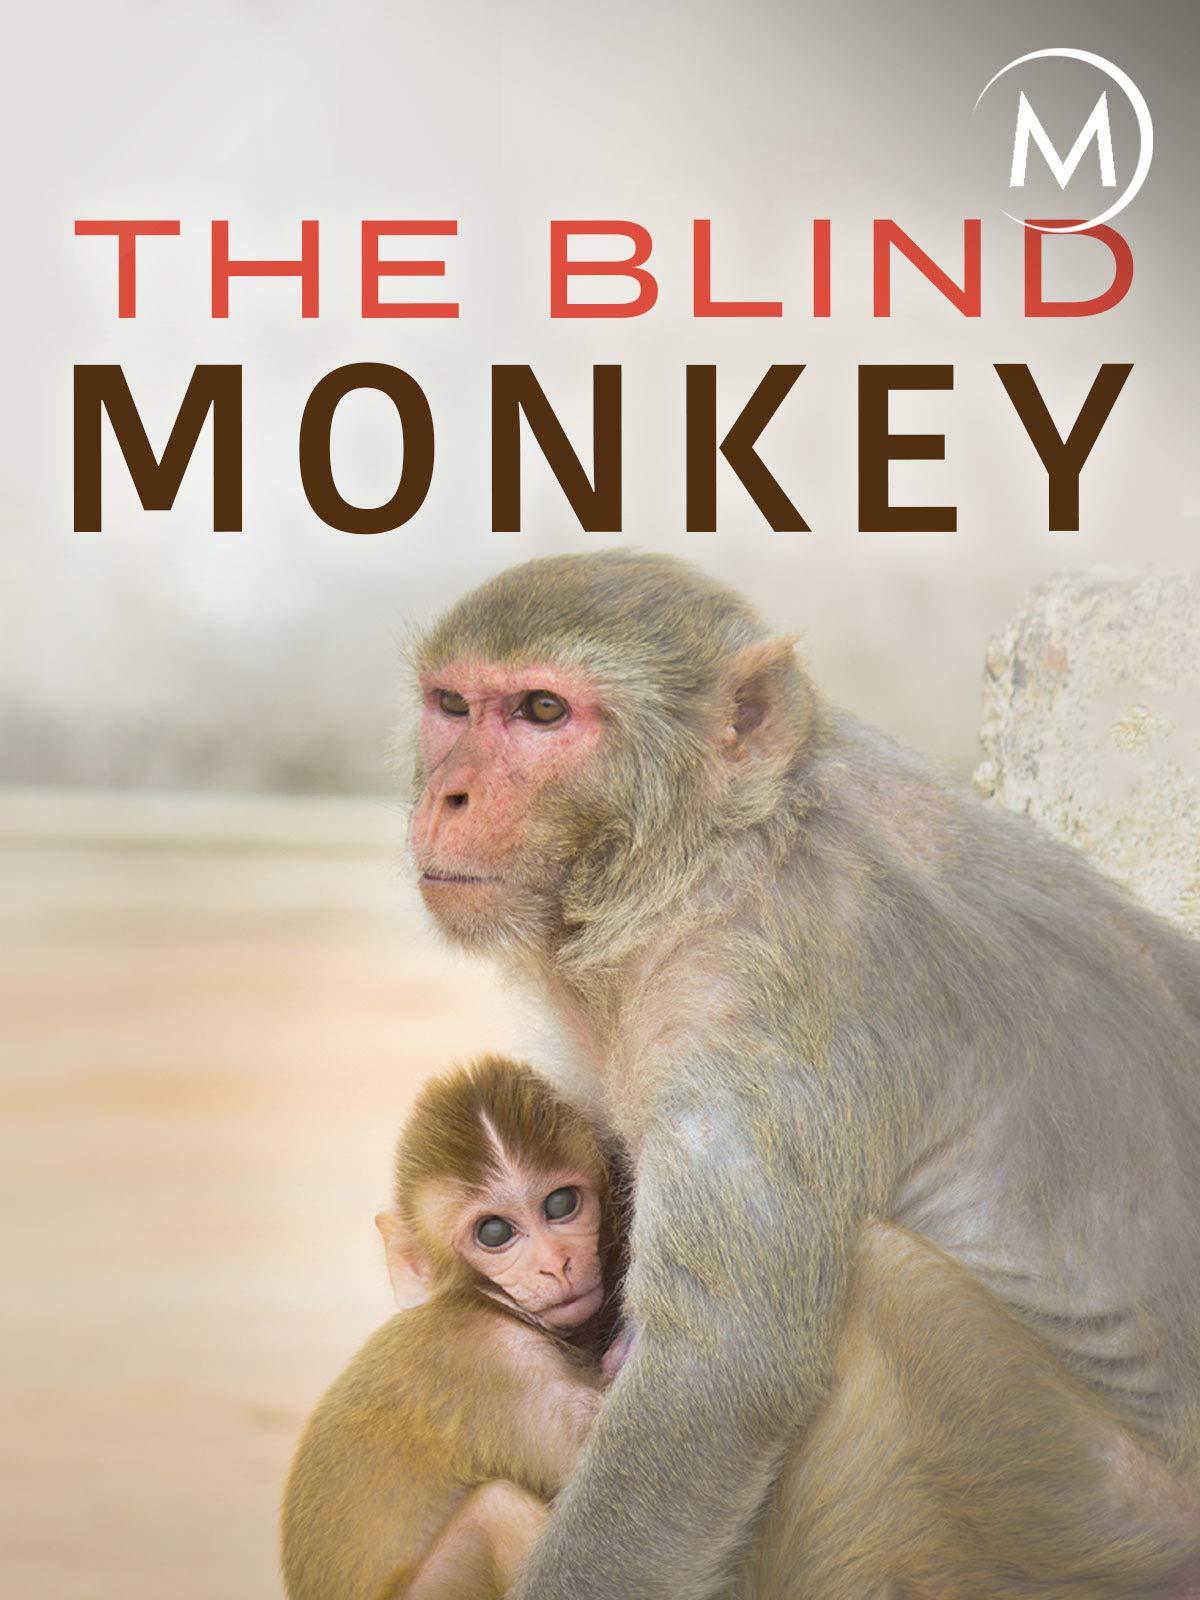 The Blind Monkey